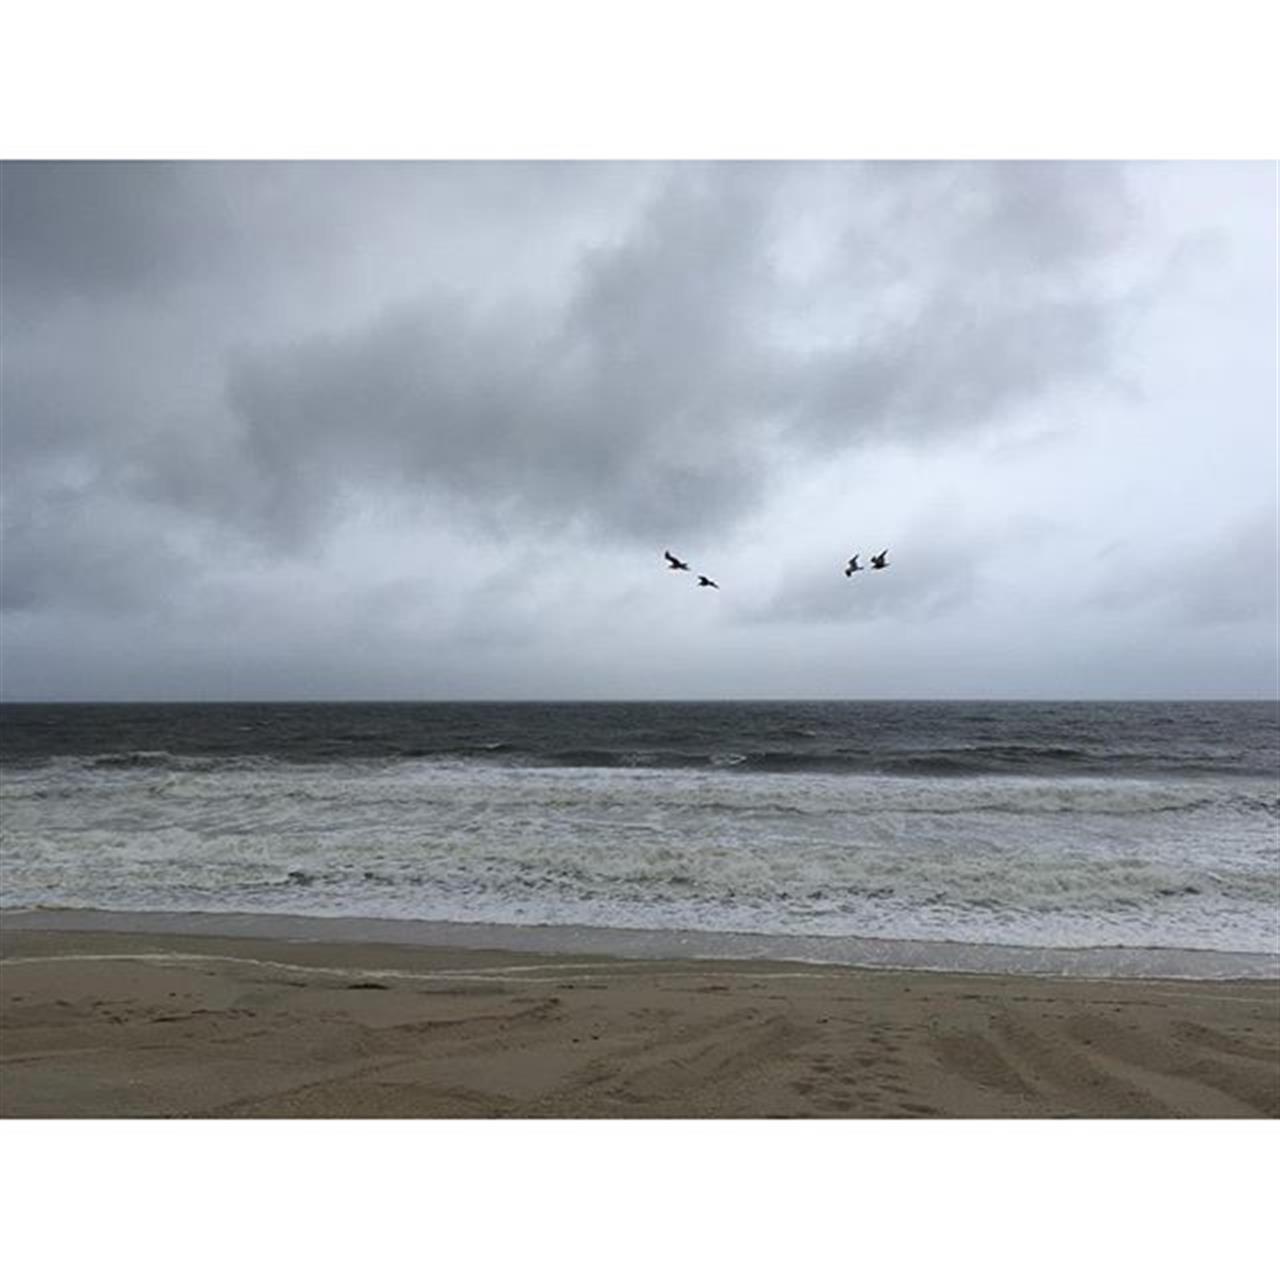 4 A stormy day in Mantoloking... #nj #goodmorning #tgif #bayhead